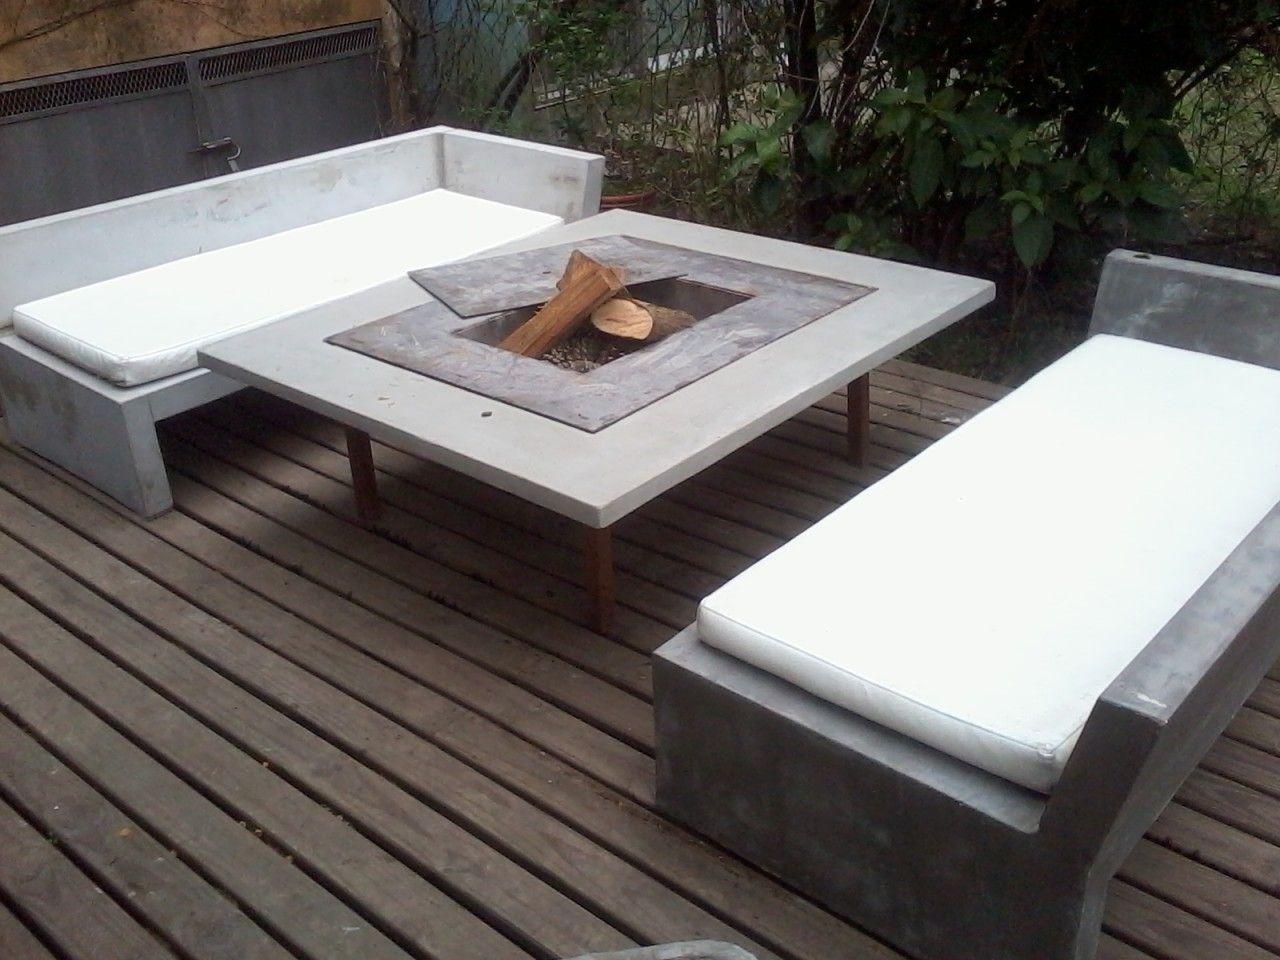 Muebles Cemento Para Jardin - Mesas Ratonas Exterior Cemento Buscar Con Google Decoracion [mjhdah]https://s-media-cache-ak0.pinimg.com/originals/fe/d6/f2/fed6f21ae5dd1b4583e8cadfb9c0b48a.jpg